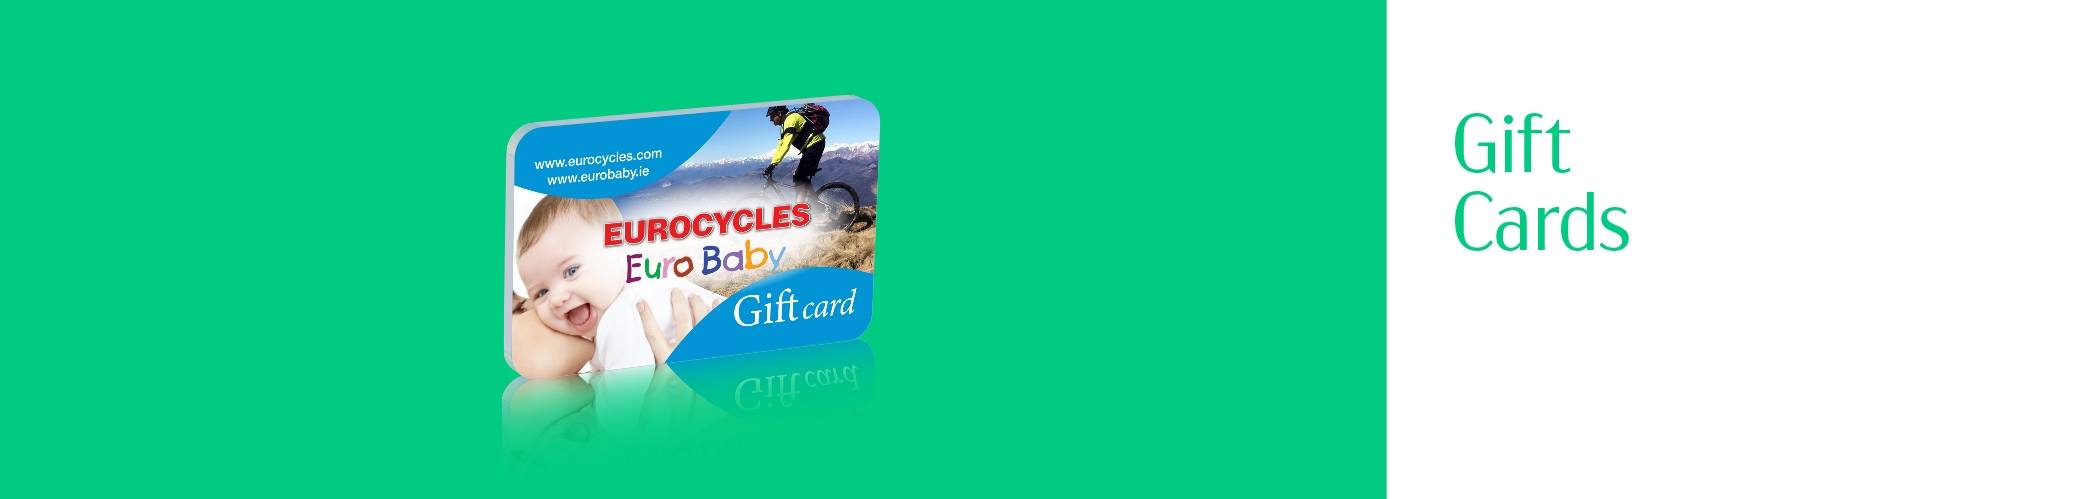 -49-giftcards-internalbanner-may21.jpg